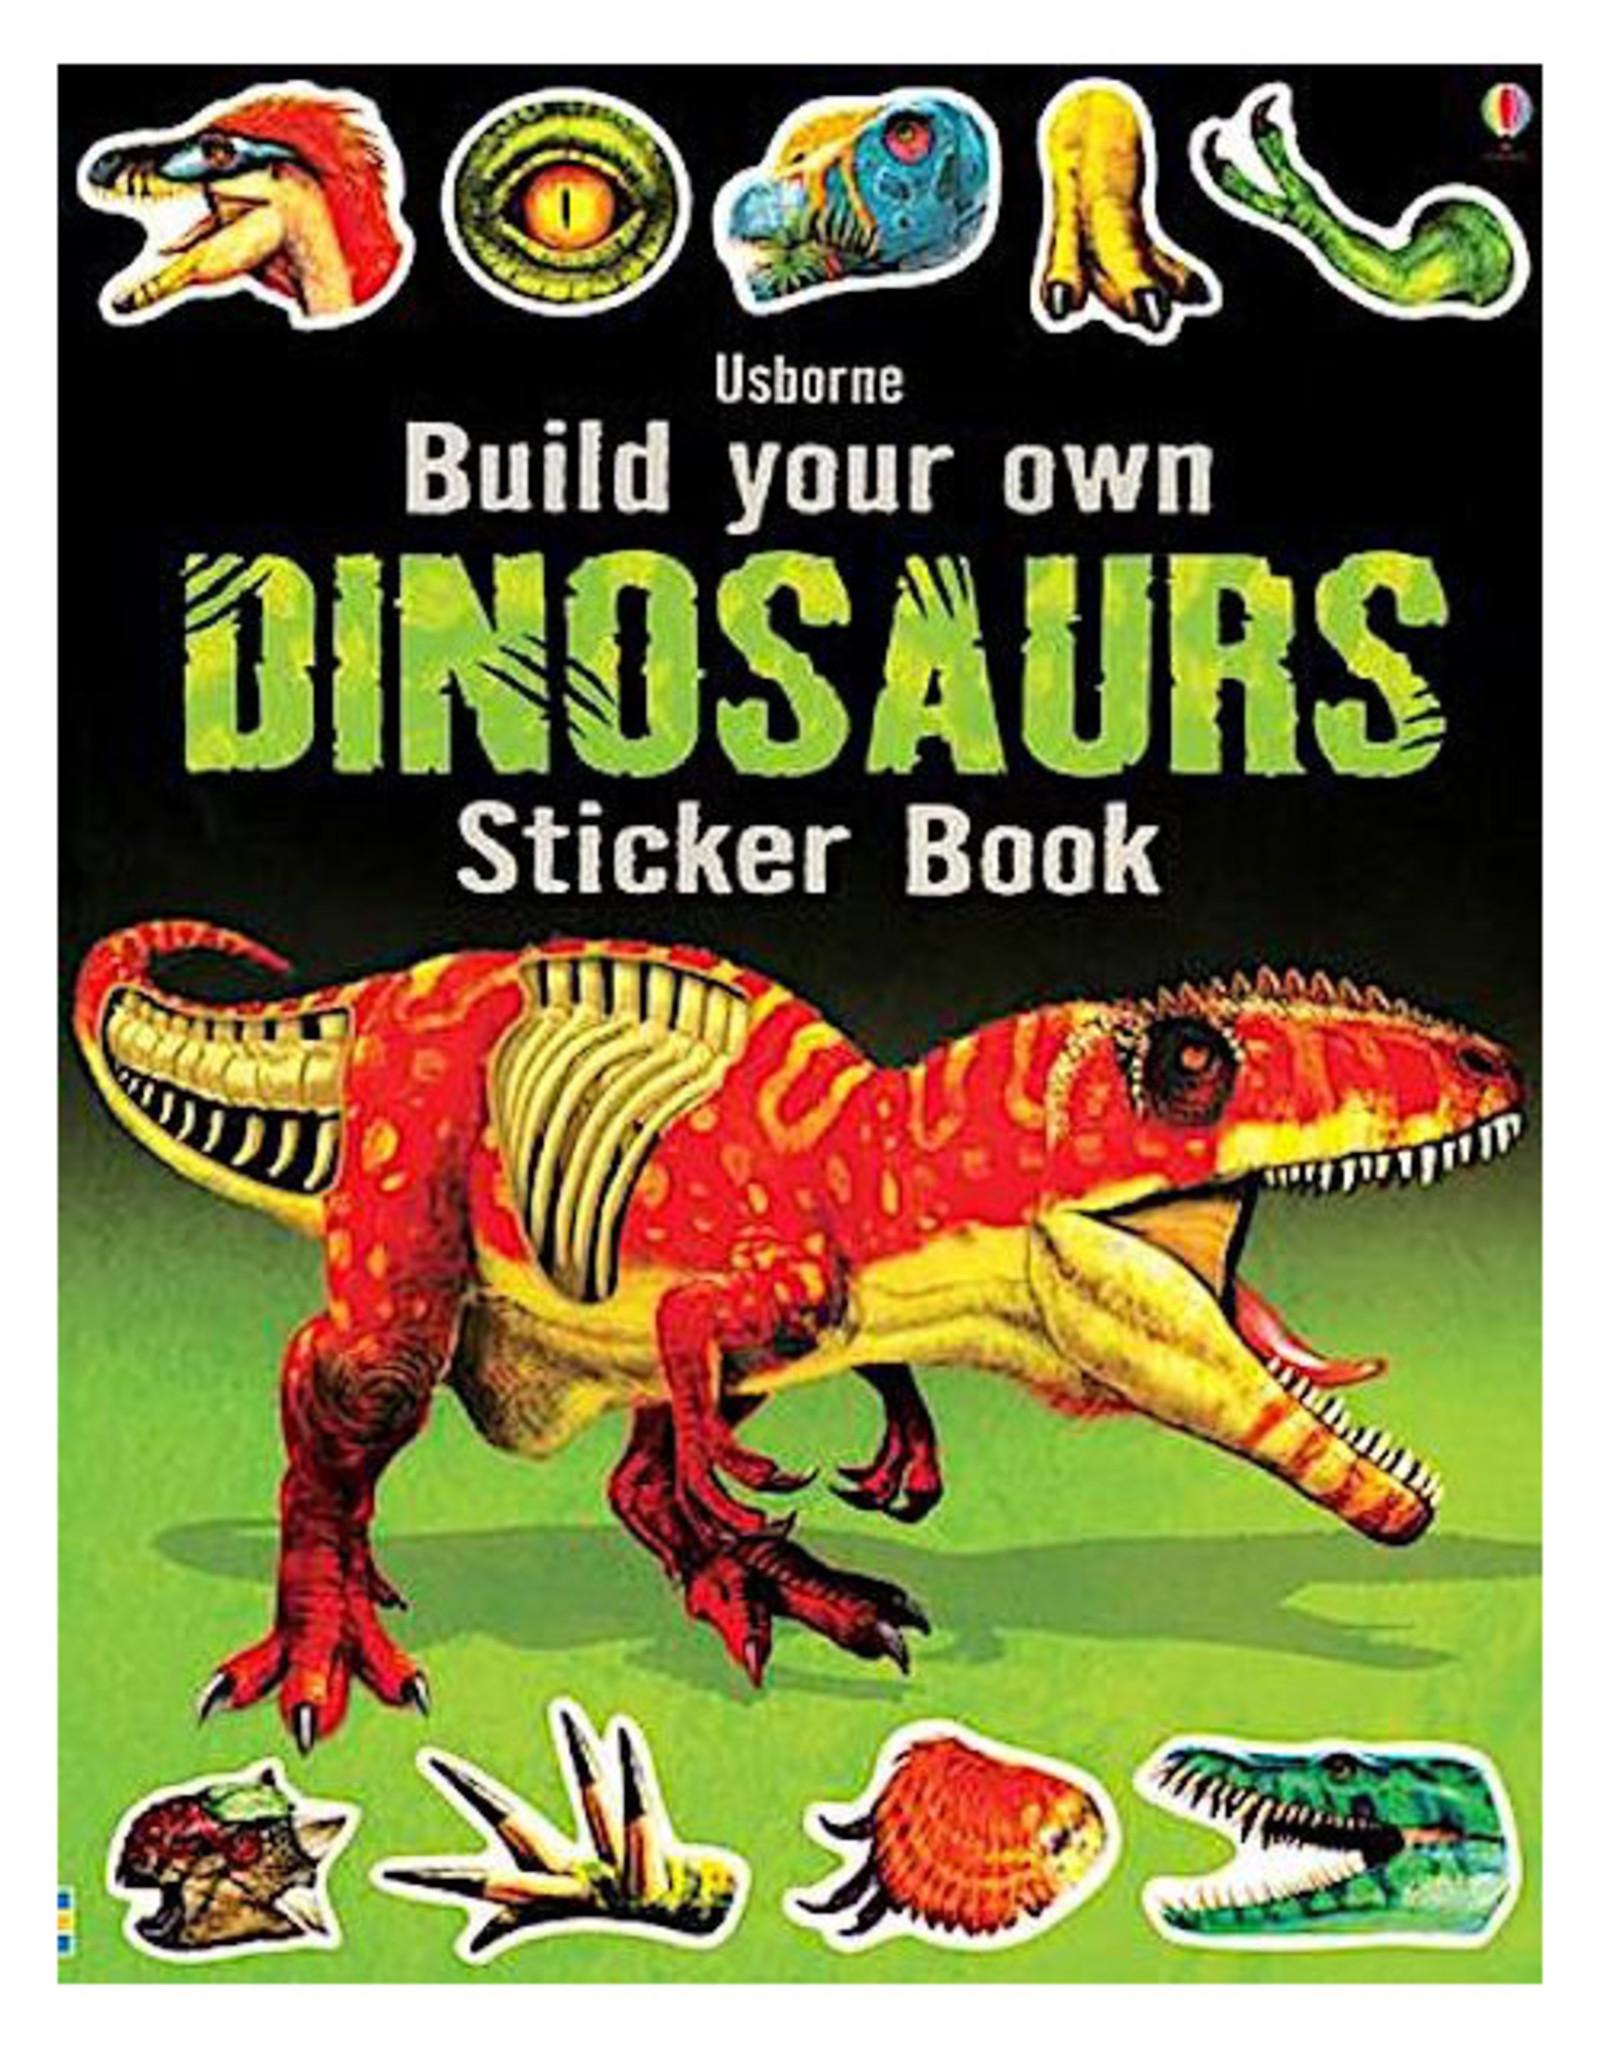 Usborne Build Your Own Dinosaurs Sticker Book